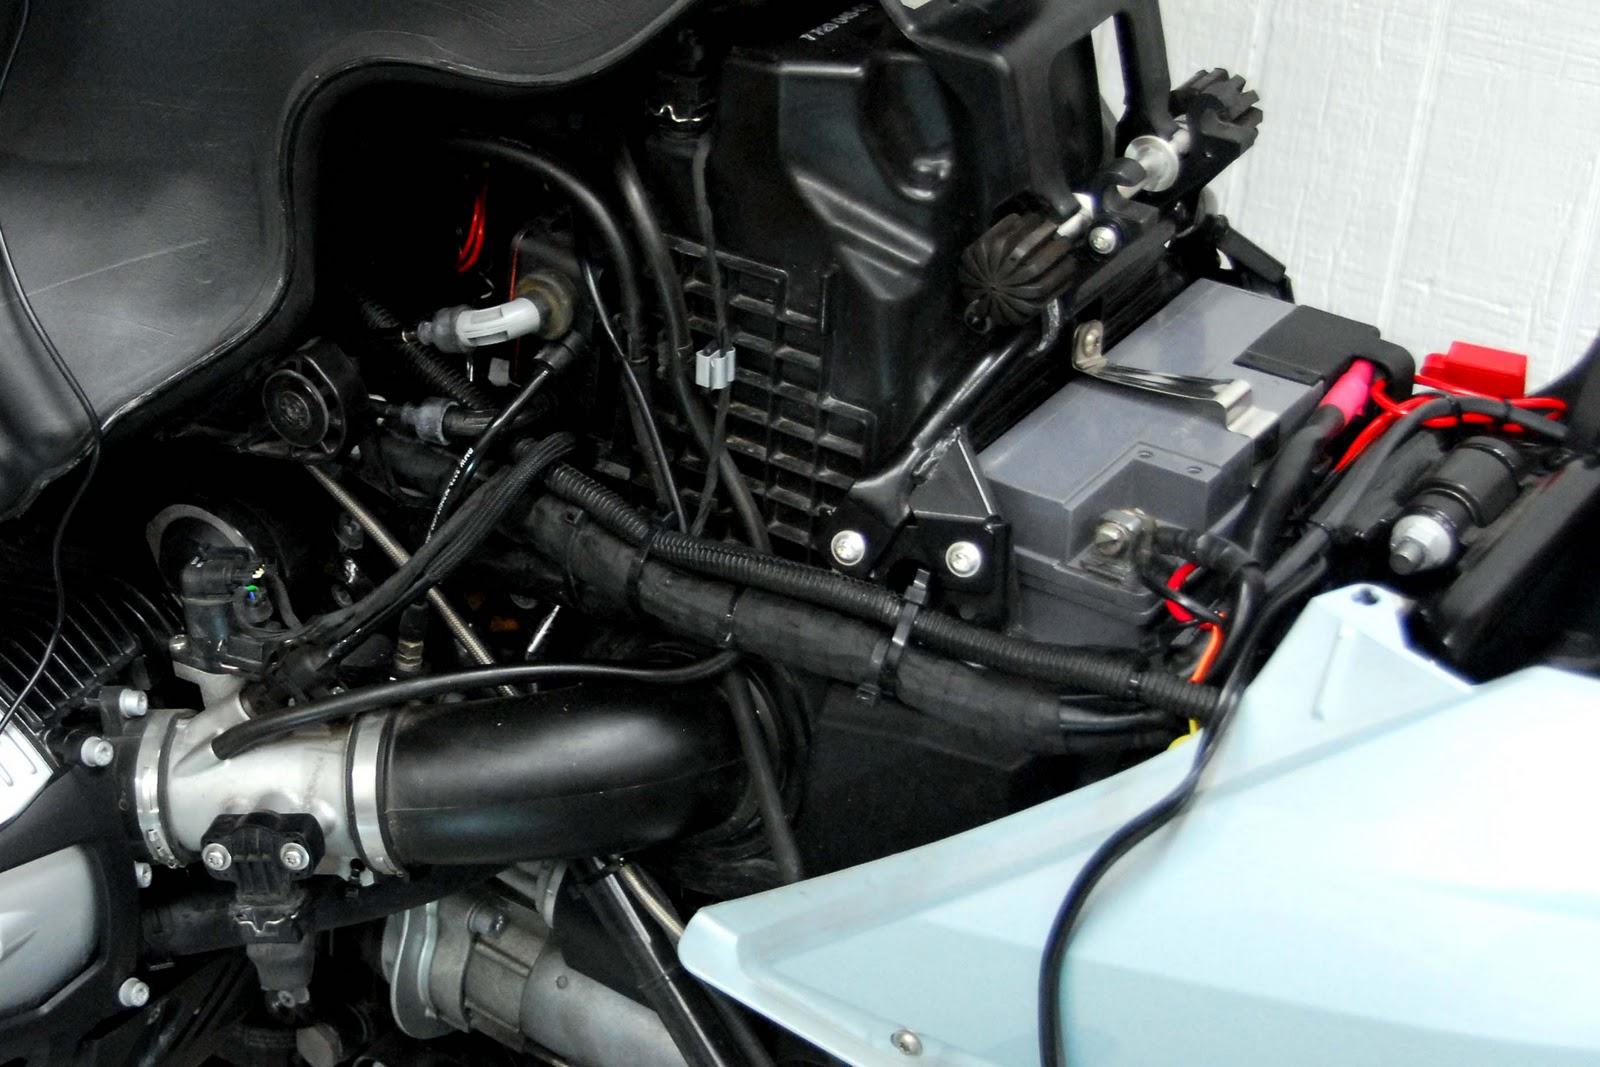 Police Bmw R1200rt Wiring Diagram BMW R 1200 RT Wiring Diagram ~ ODICIS